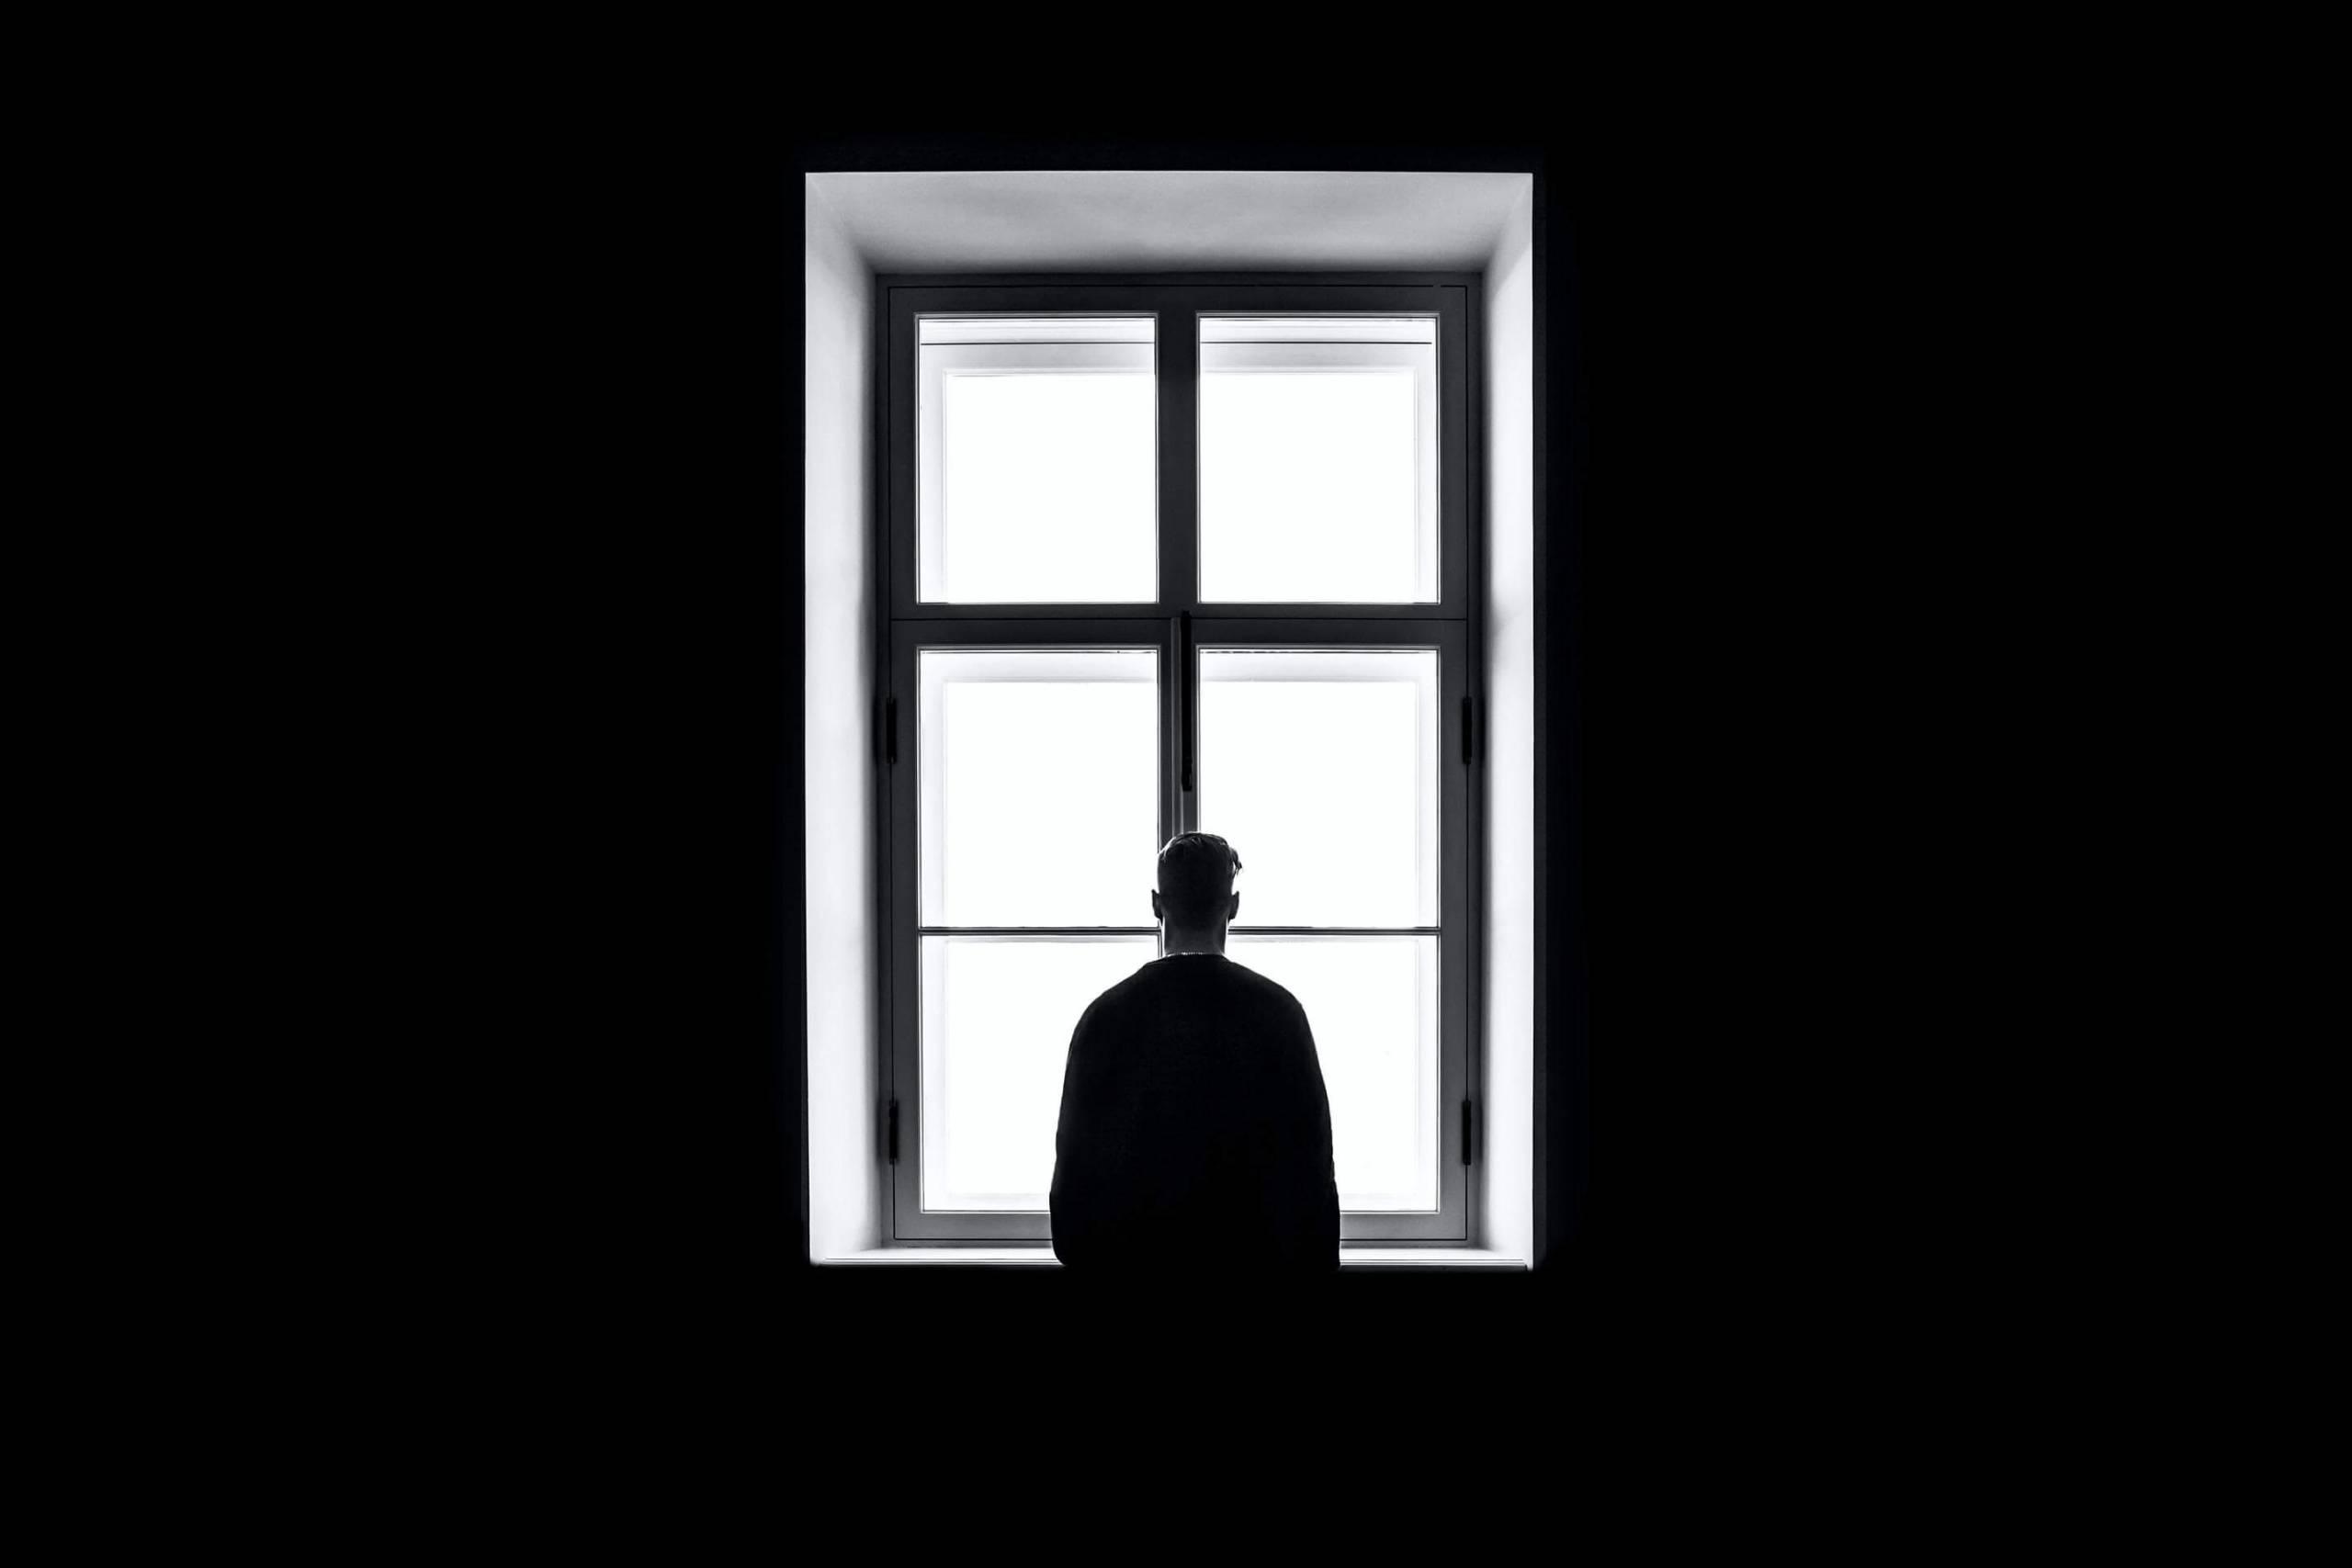 depresyona-psikanalitik-ve-varoluscu-bakis